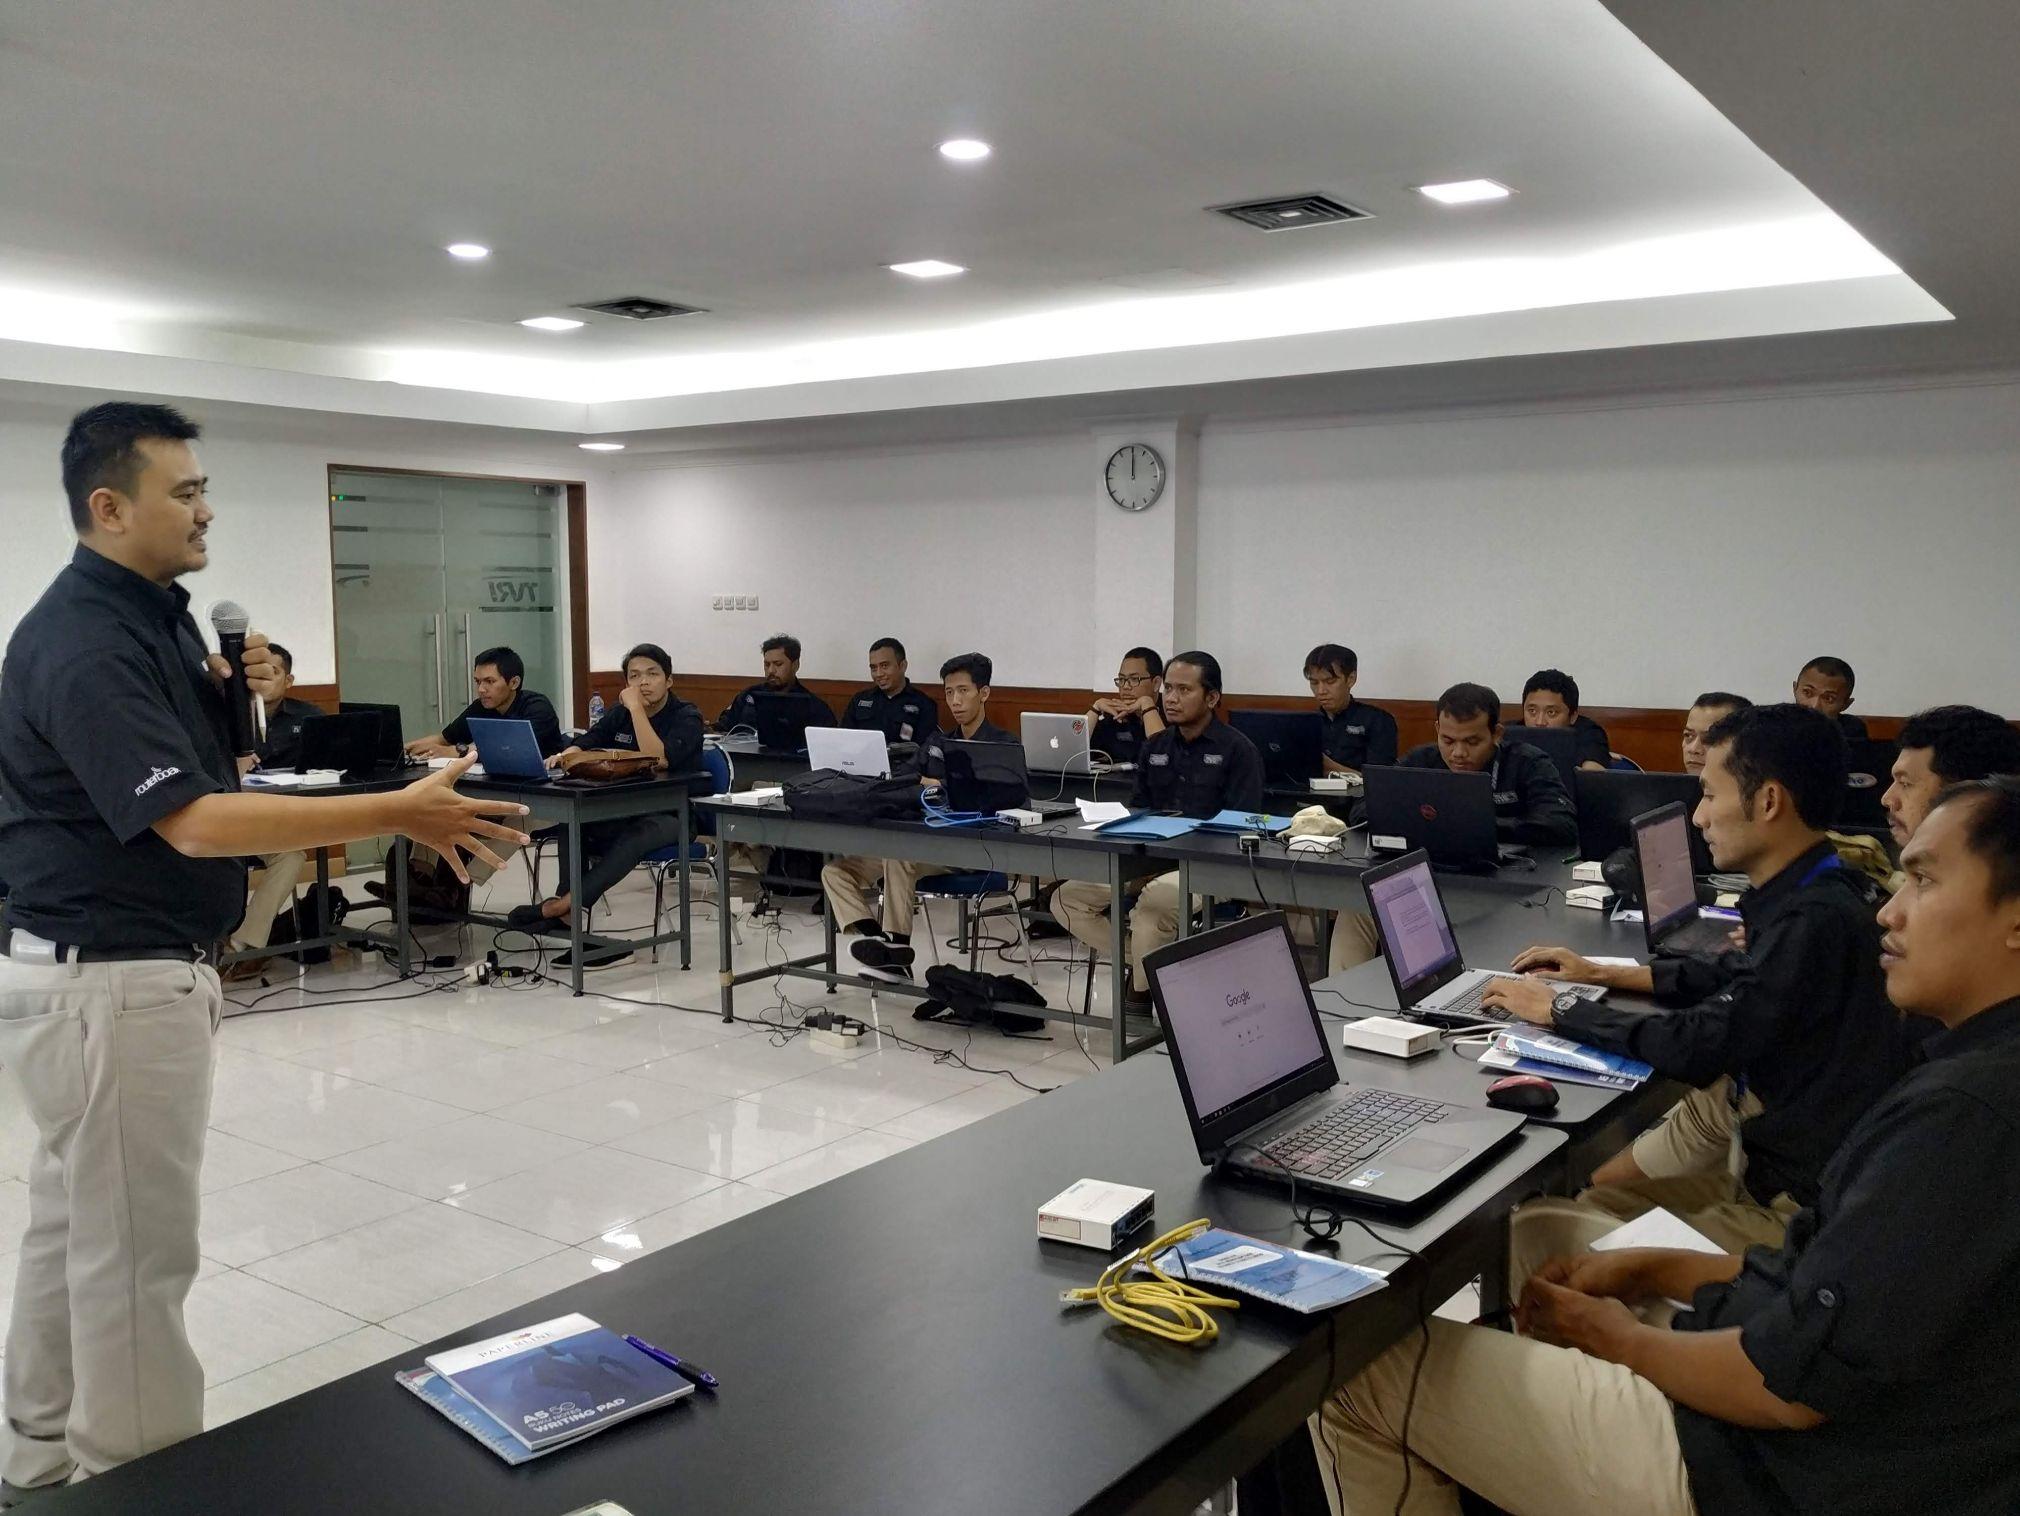 belajar, mikrotik, sertifikasi, training, IMG_20190311_115812